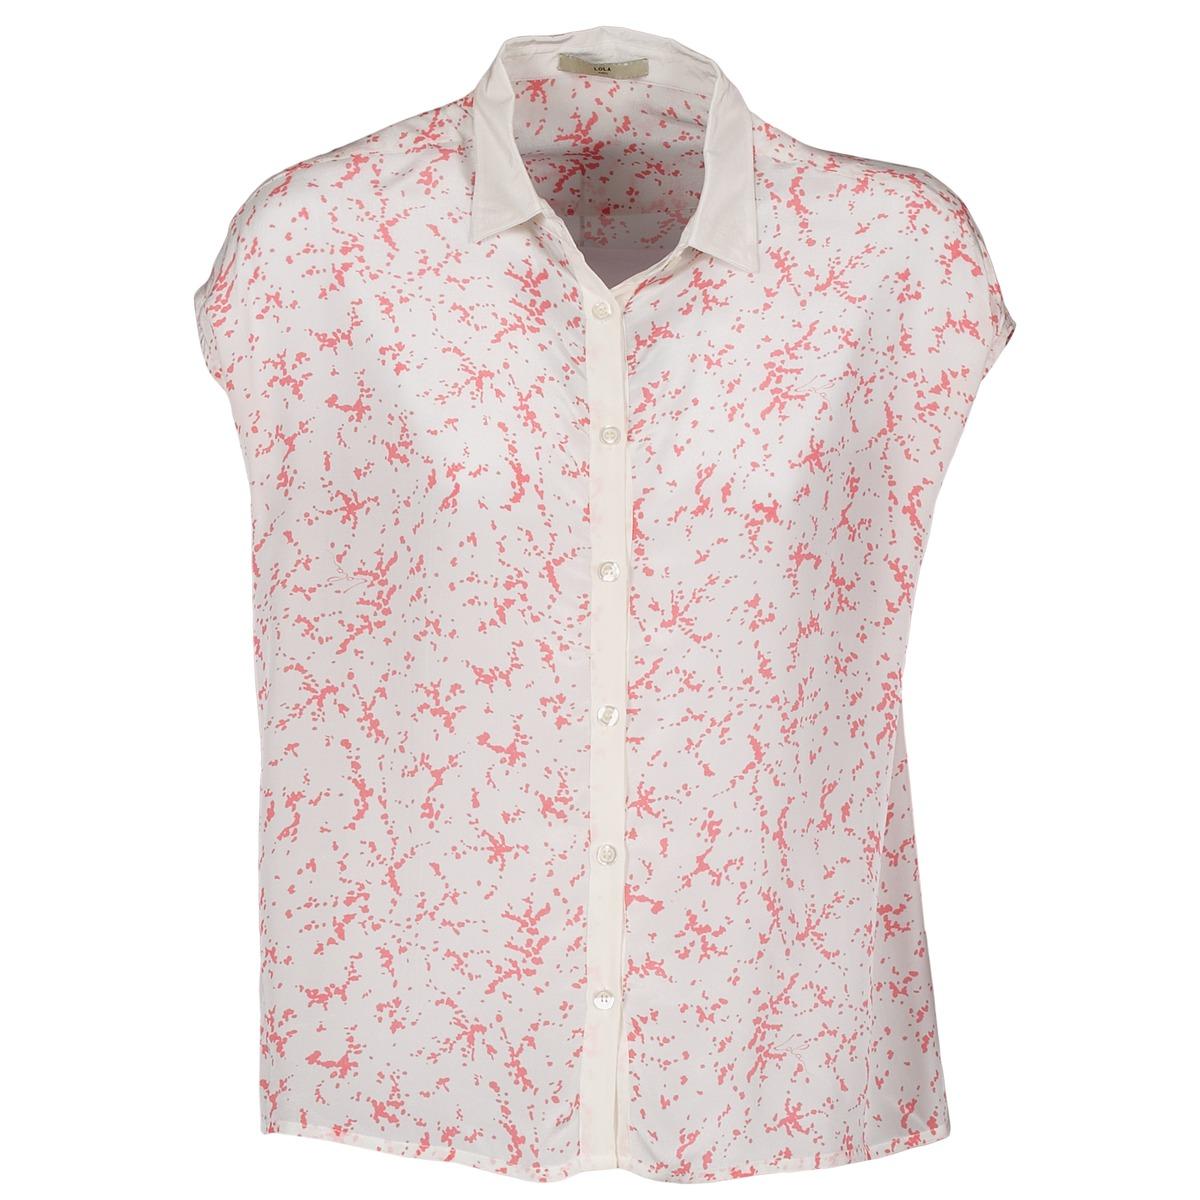 Lola Kurzarm Hemdbluse CANYON jetztbilligerkaufen